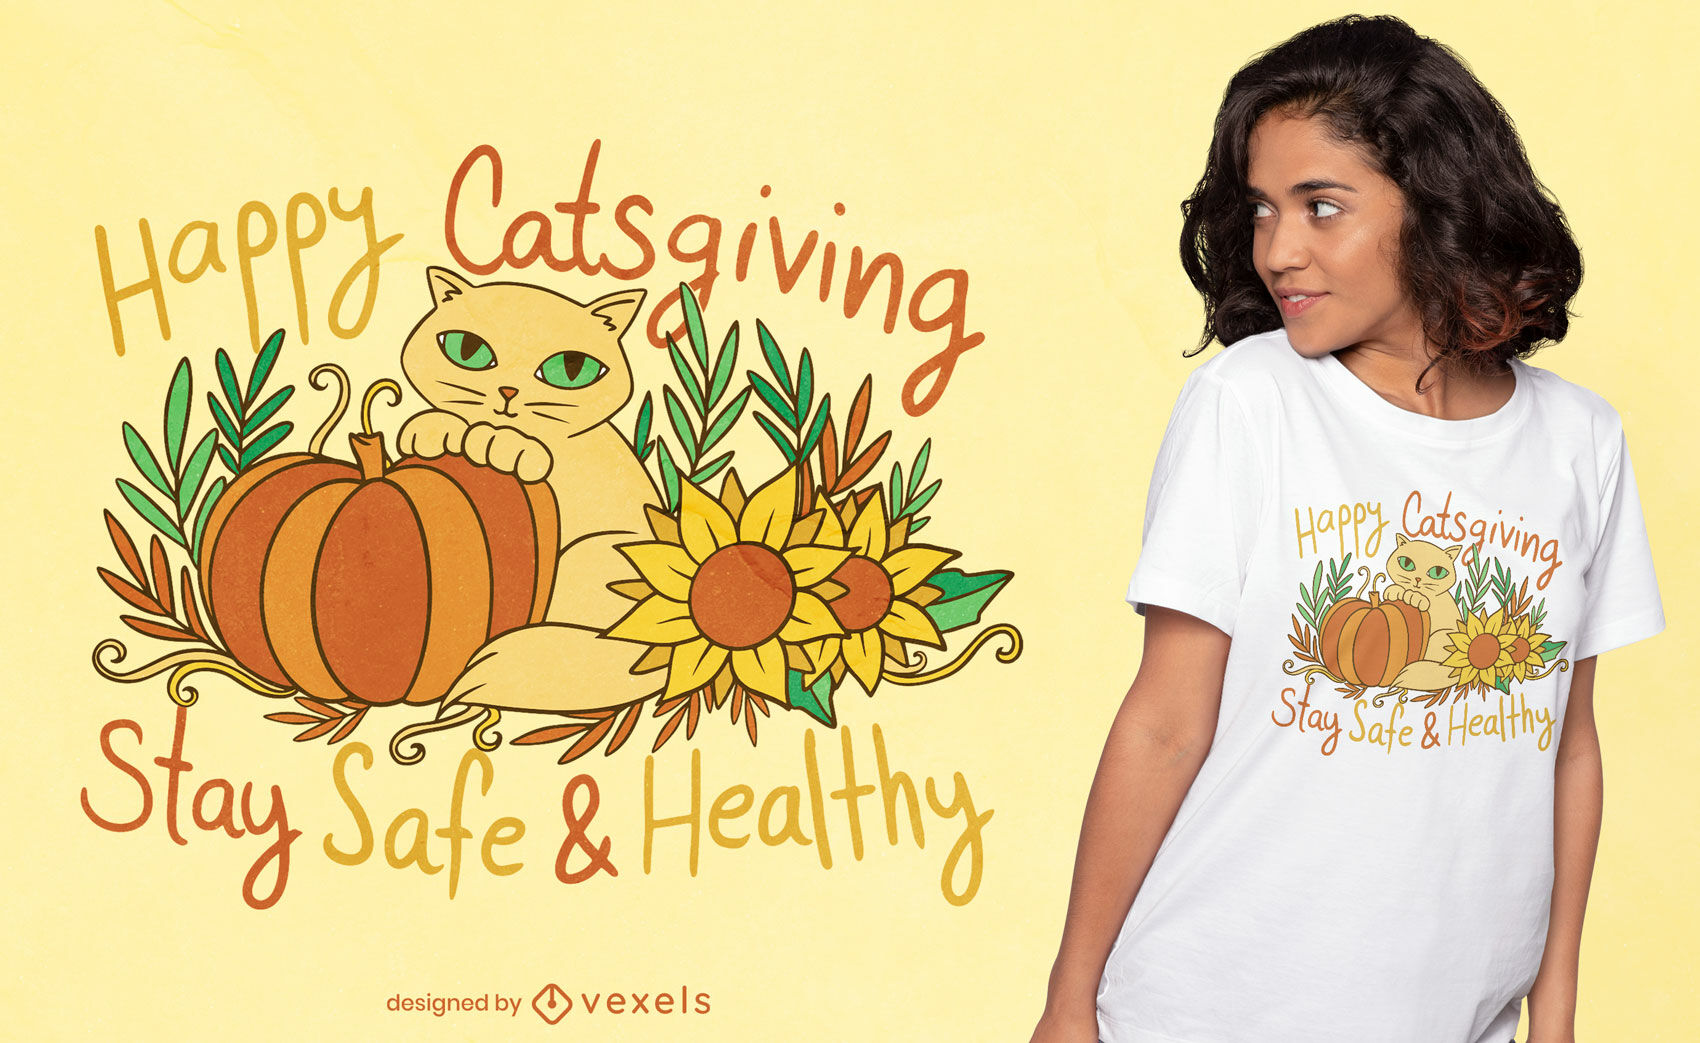 Happy catsgiving t-shirt design